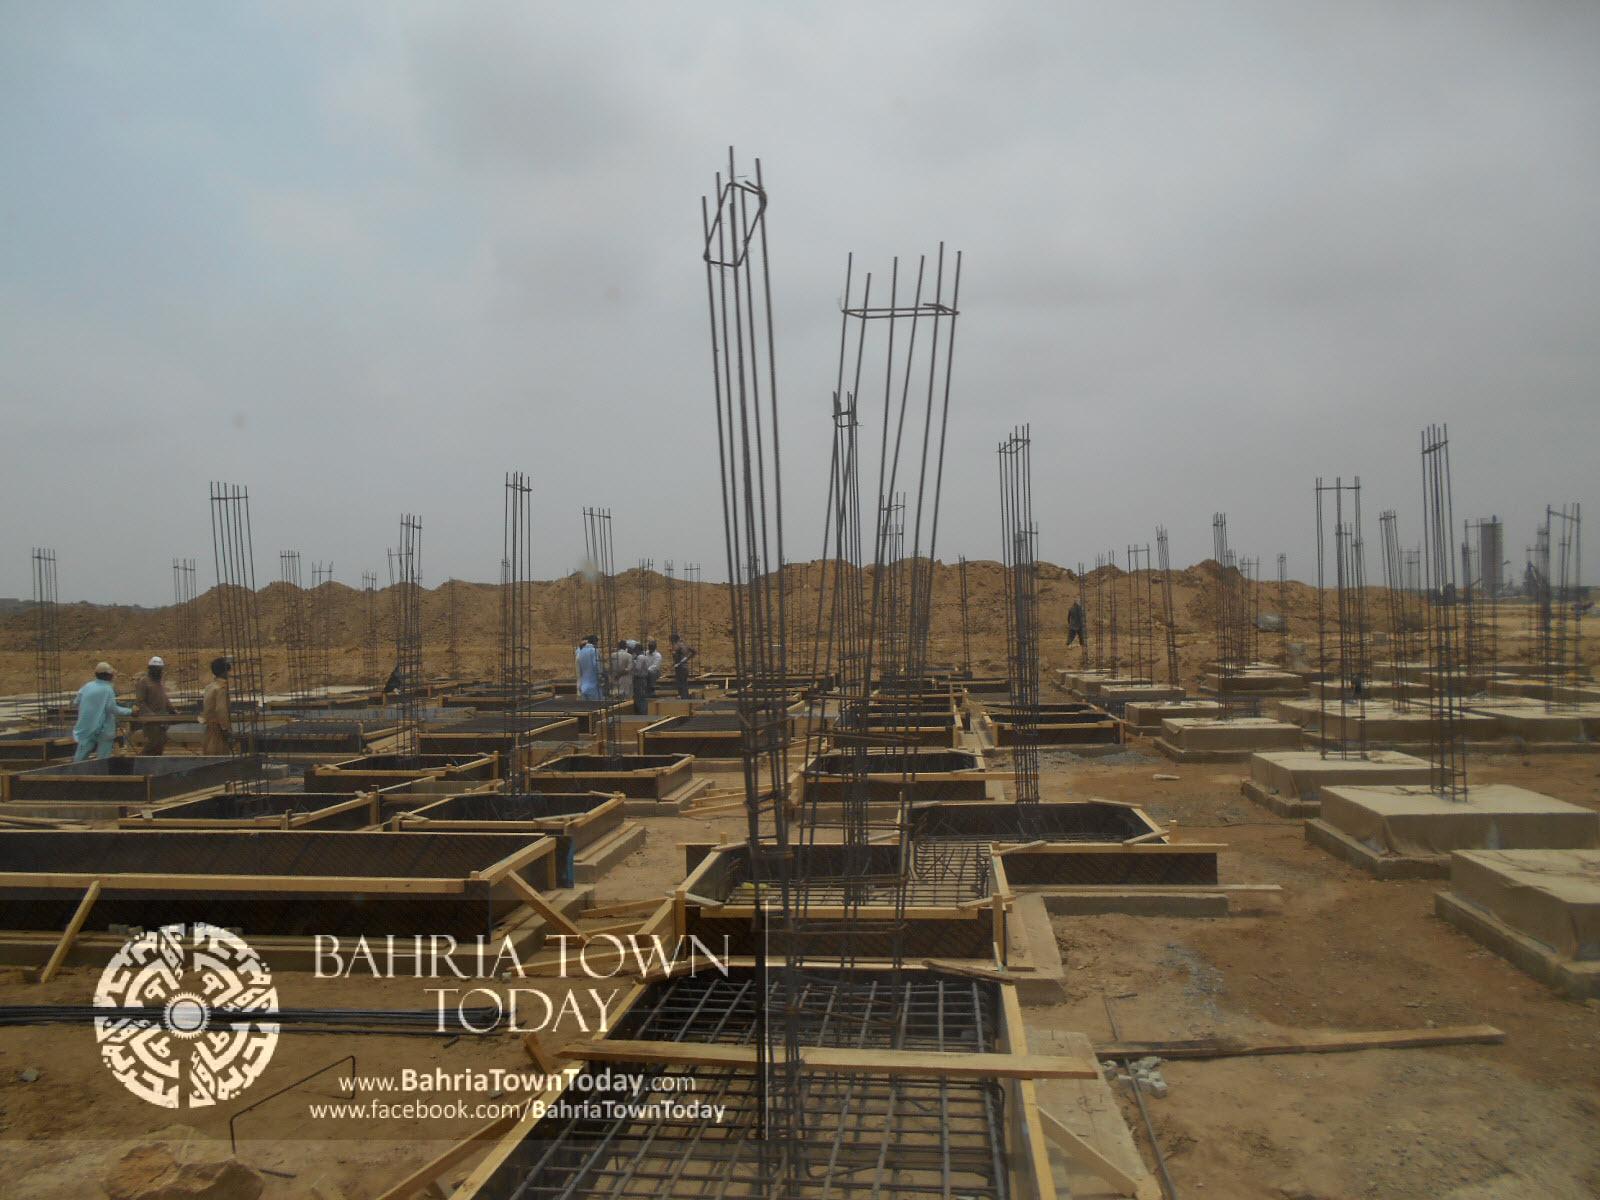 Bahria Town Karachi Latest Progress Update – June 2014 (44)